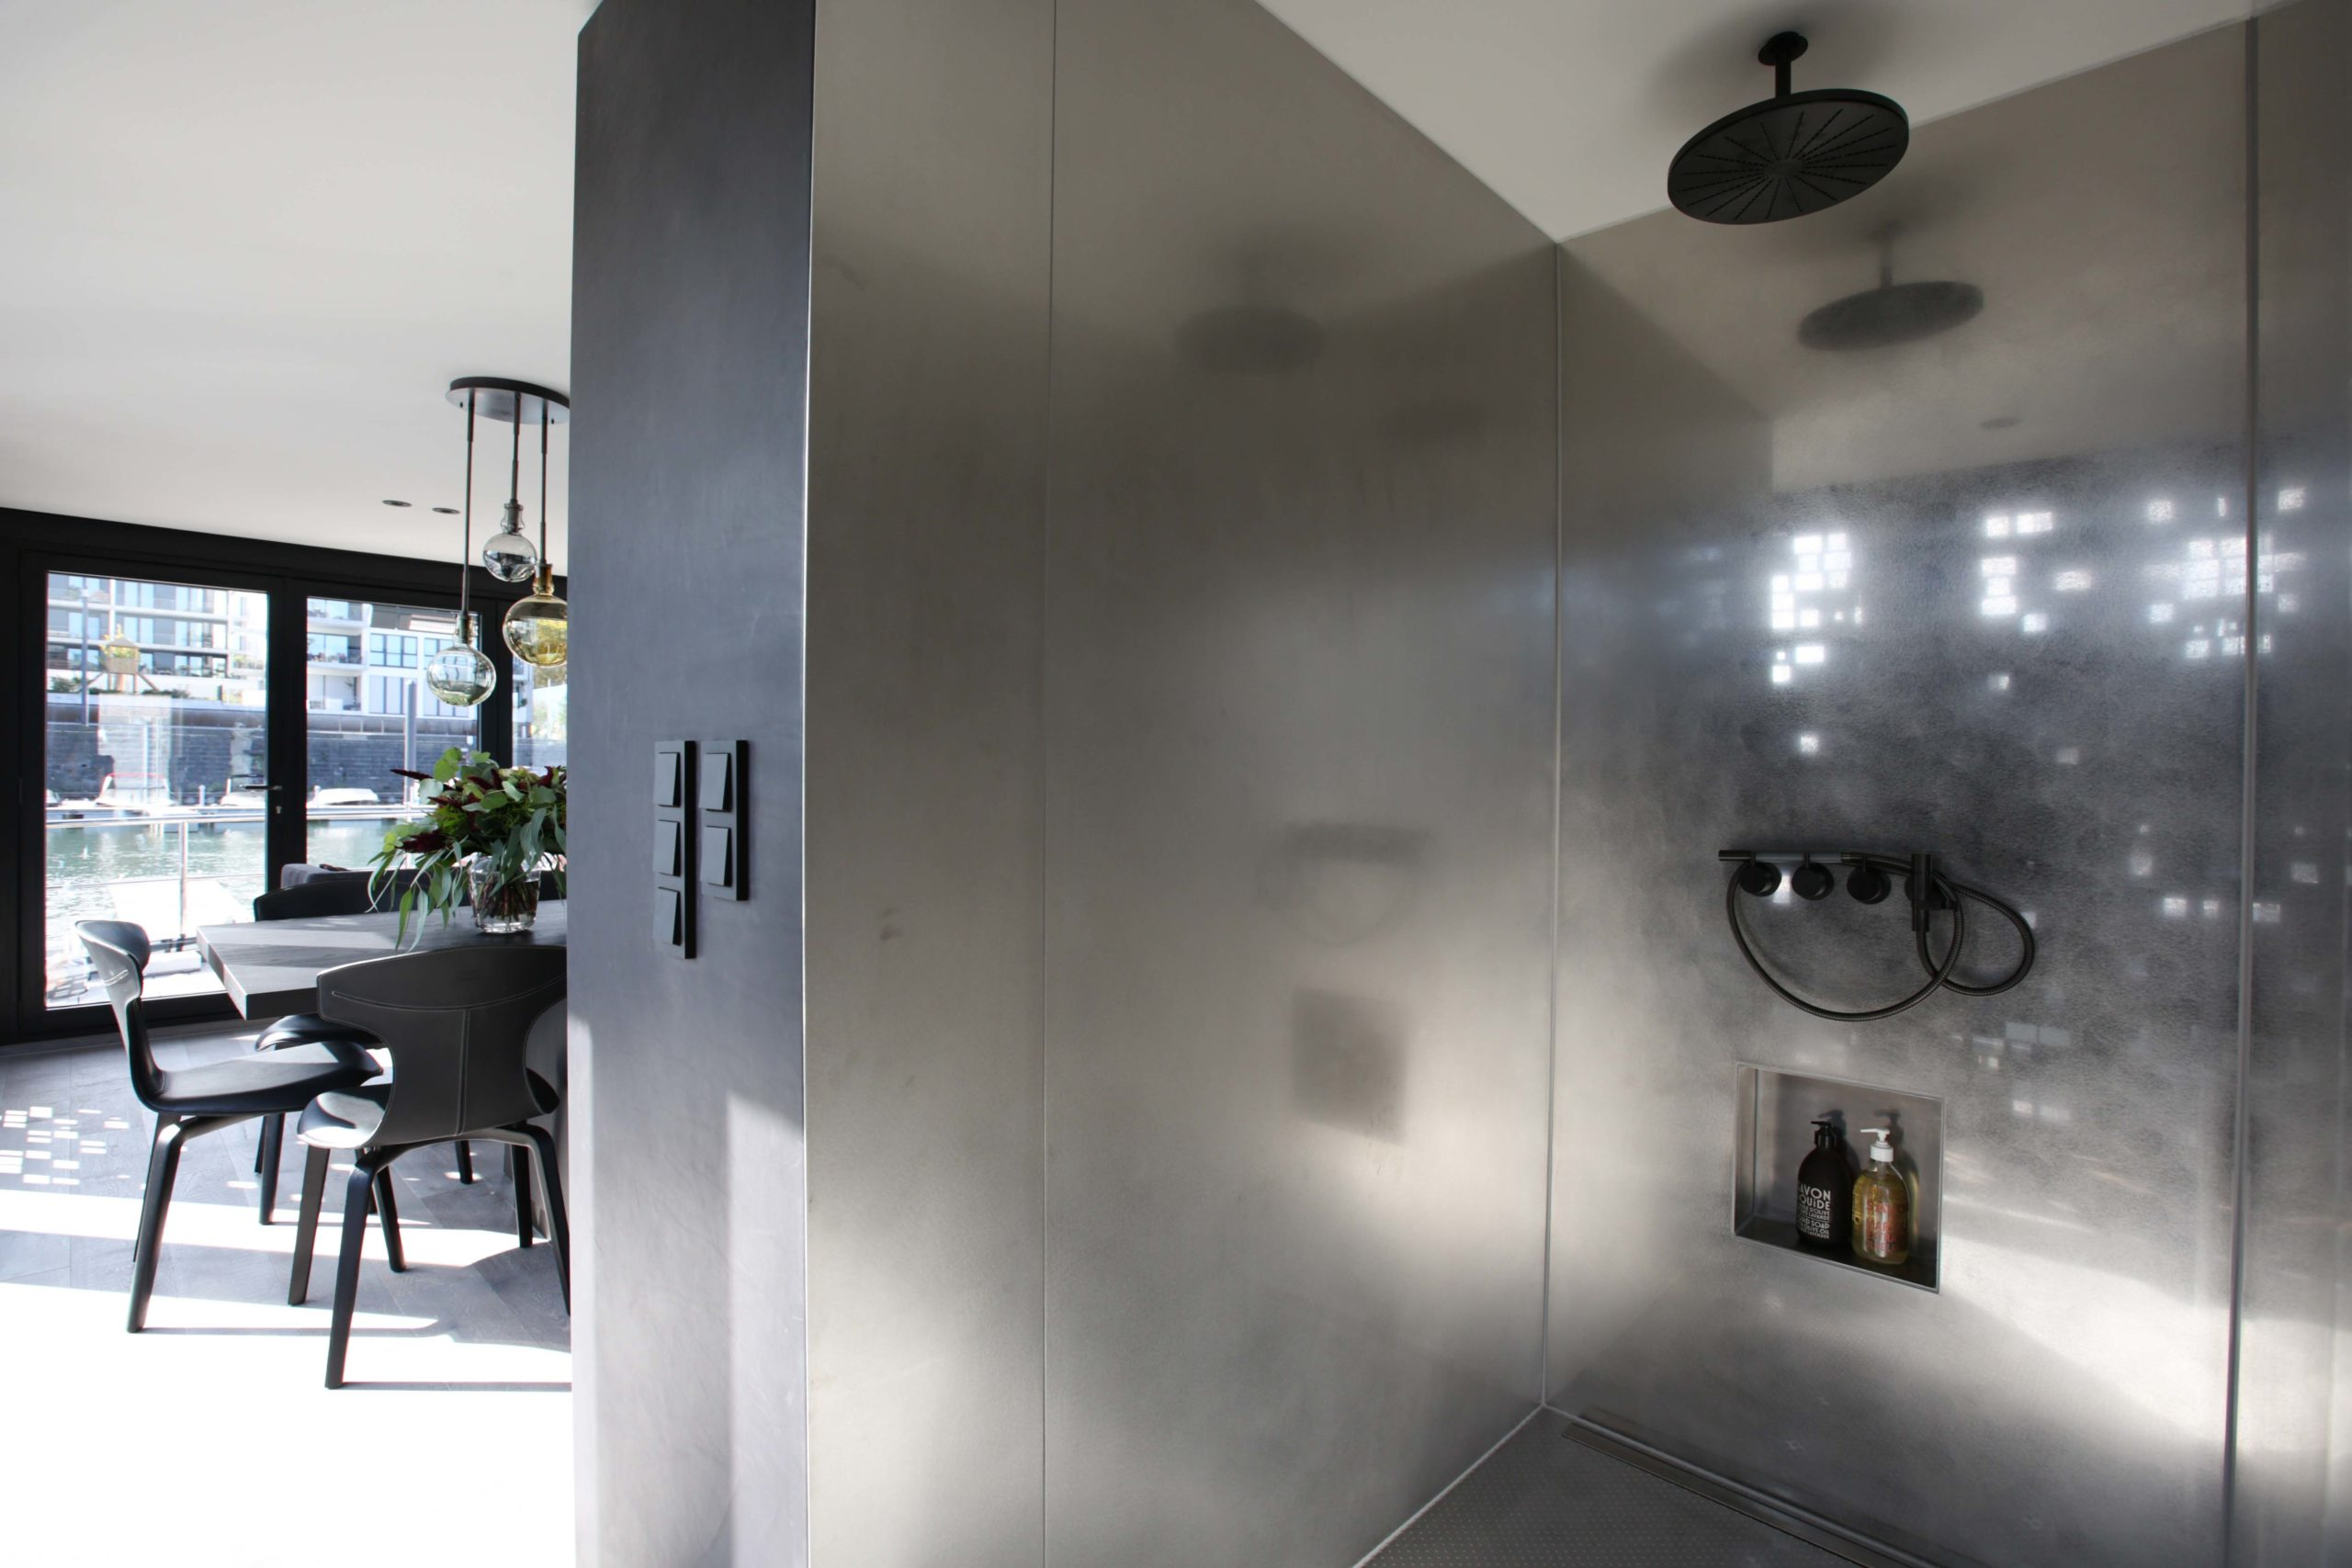 Badezimmereinrichtung Dusche Onyx Hausboot